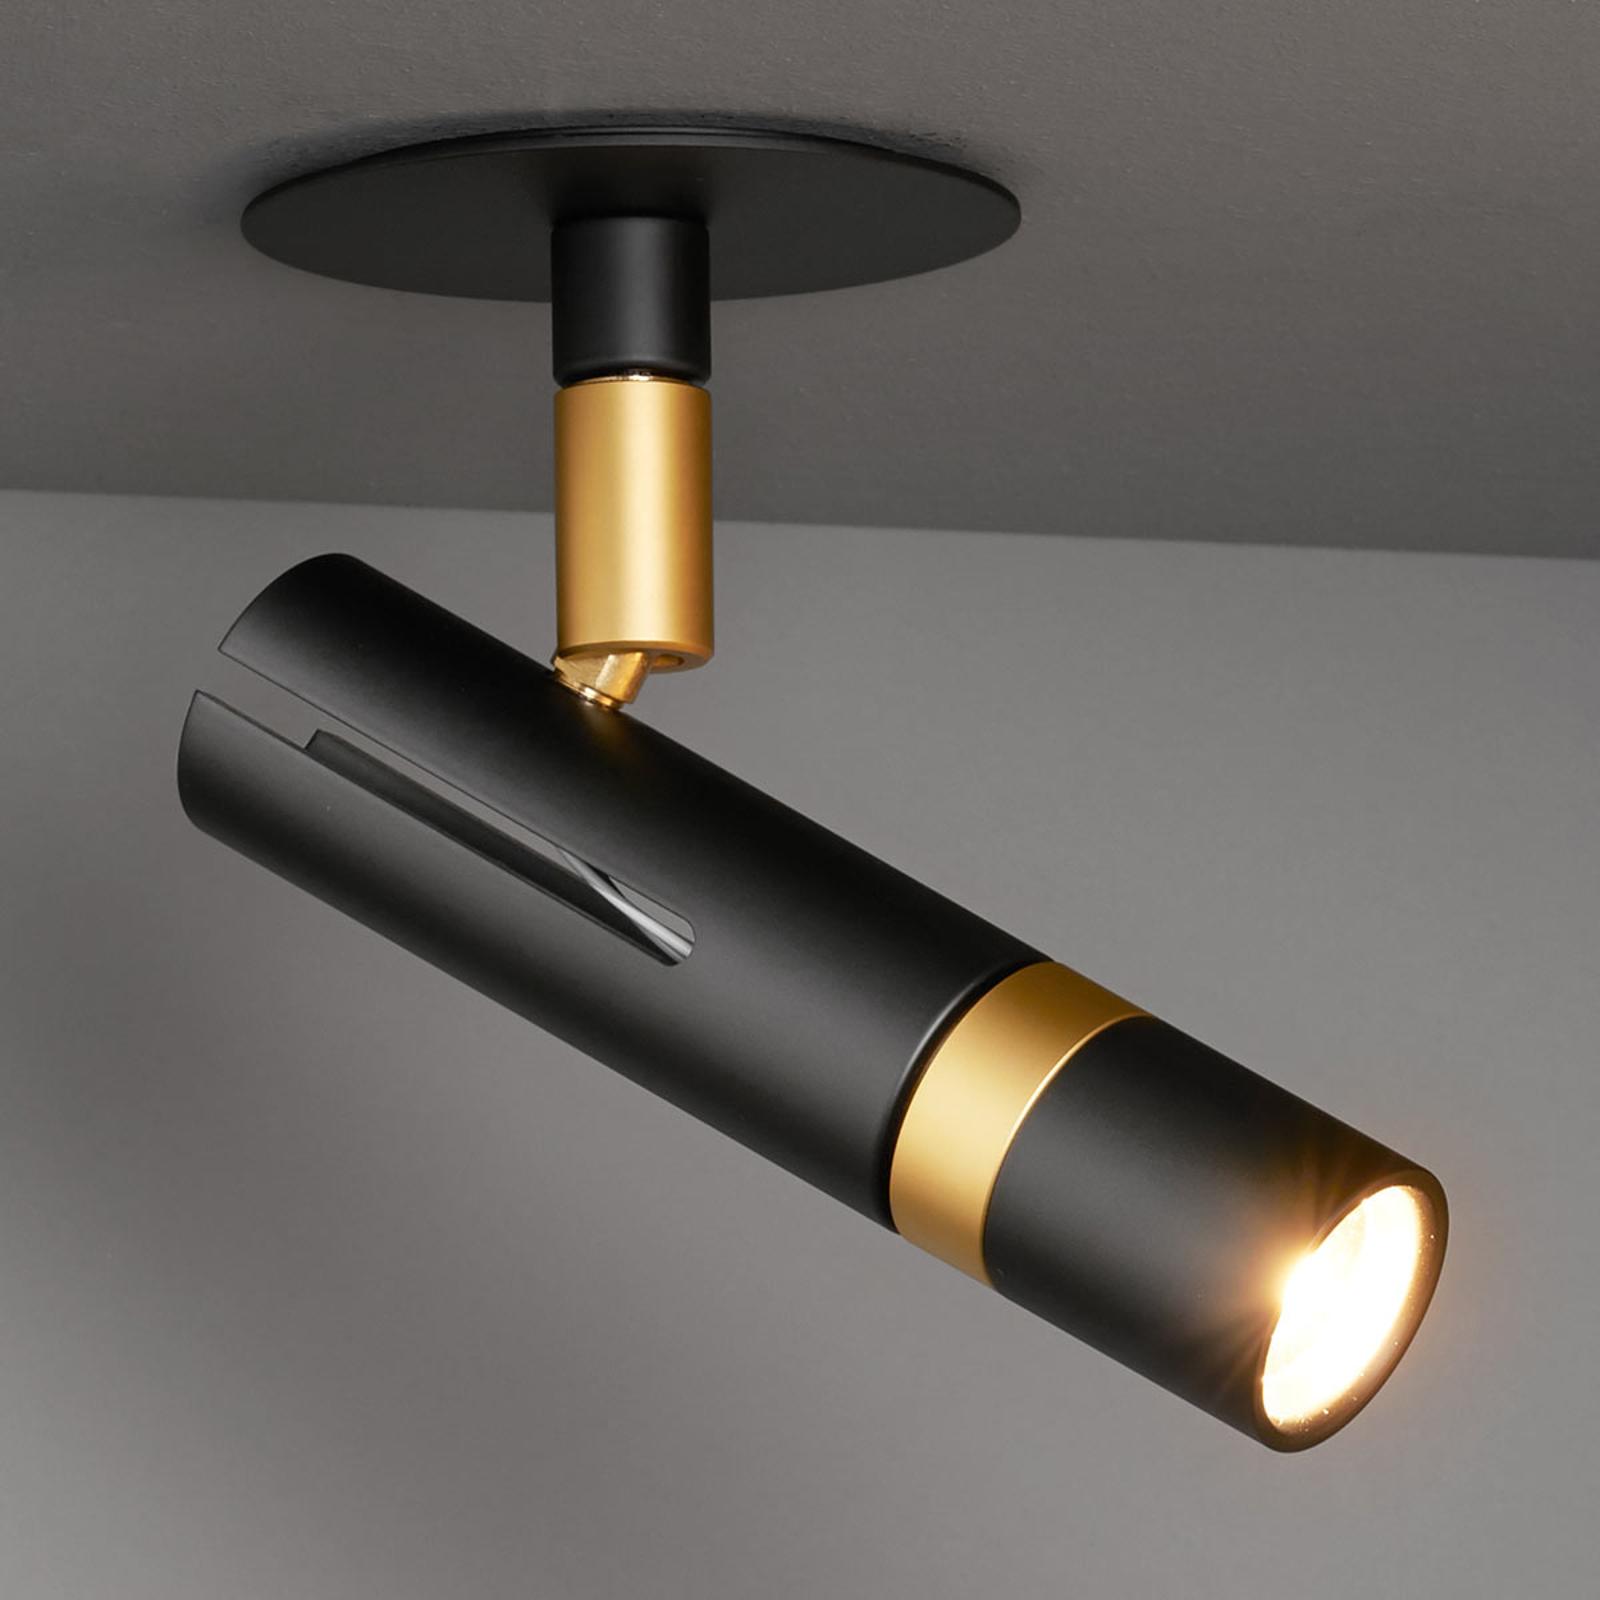 LDM Kyno LED-Spot Deckenhalter Einbau schwarz/gold